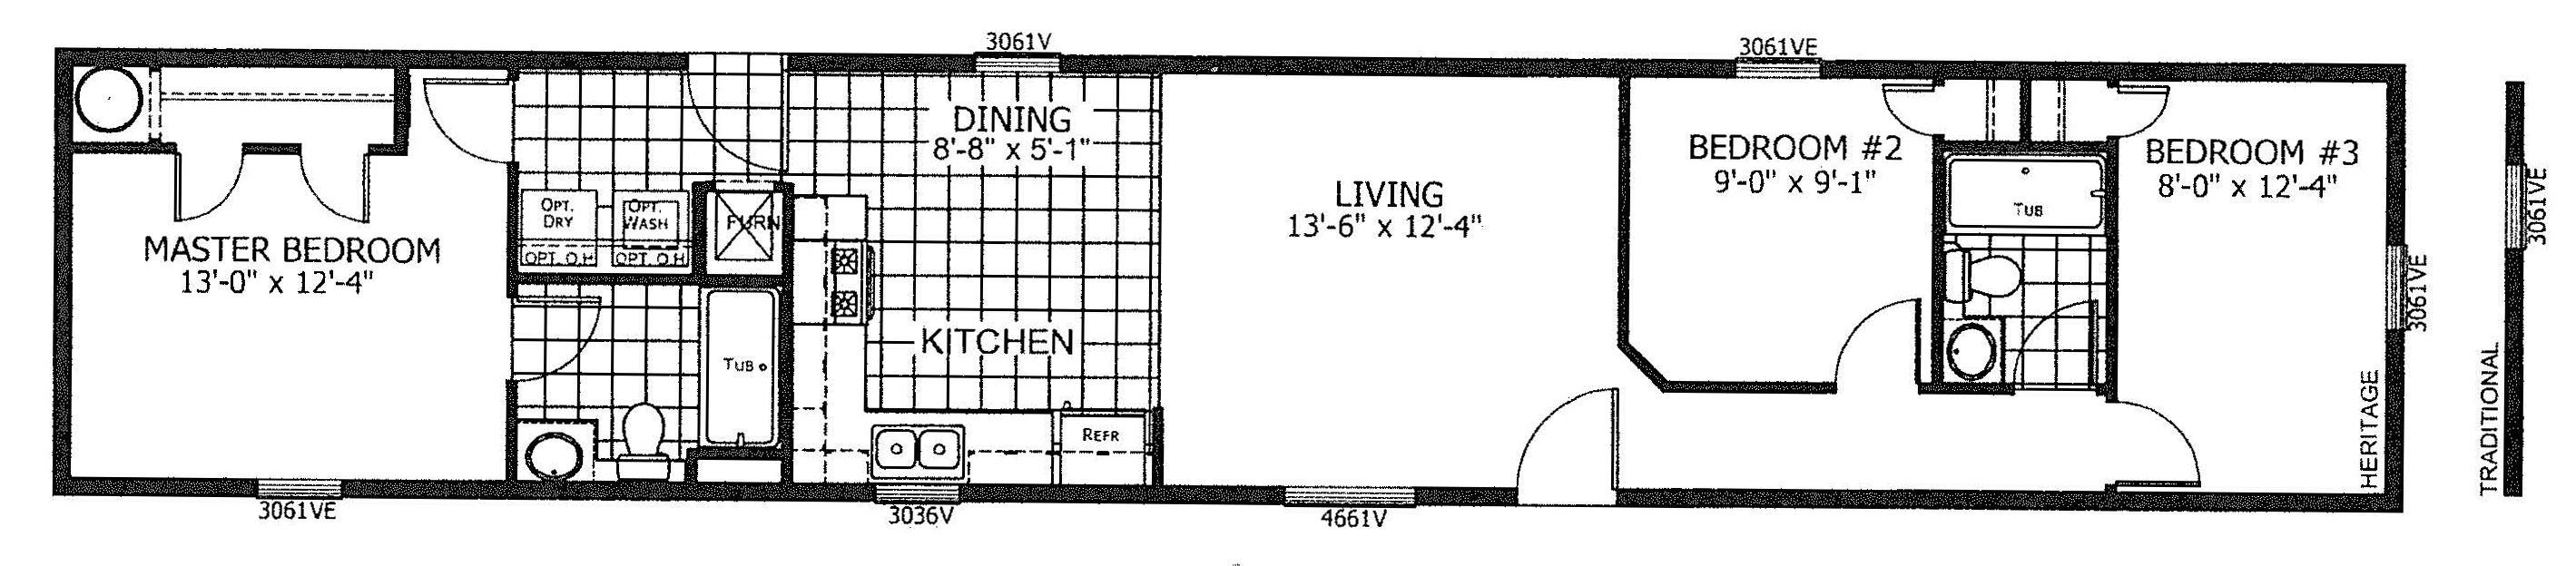 Floorplan of Model 19-7999